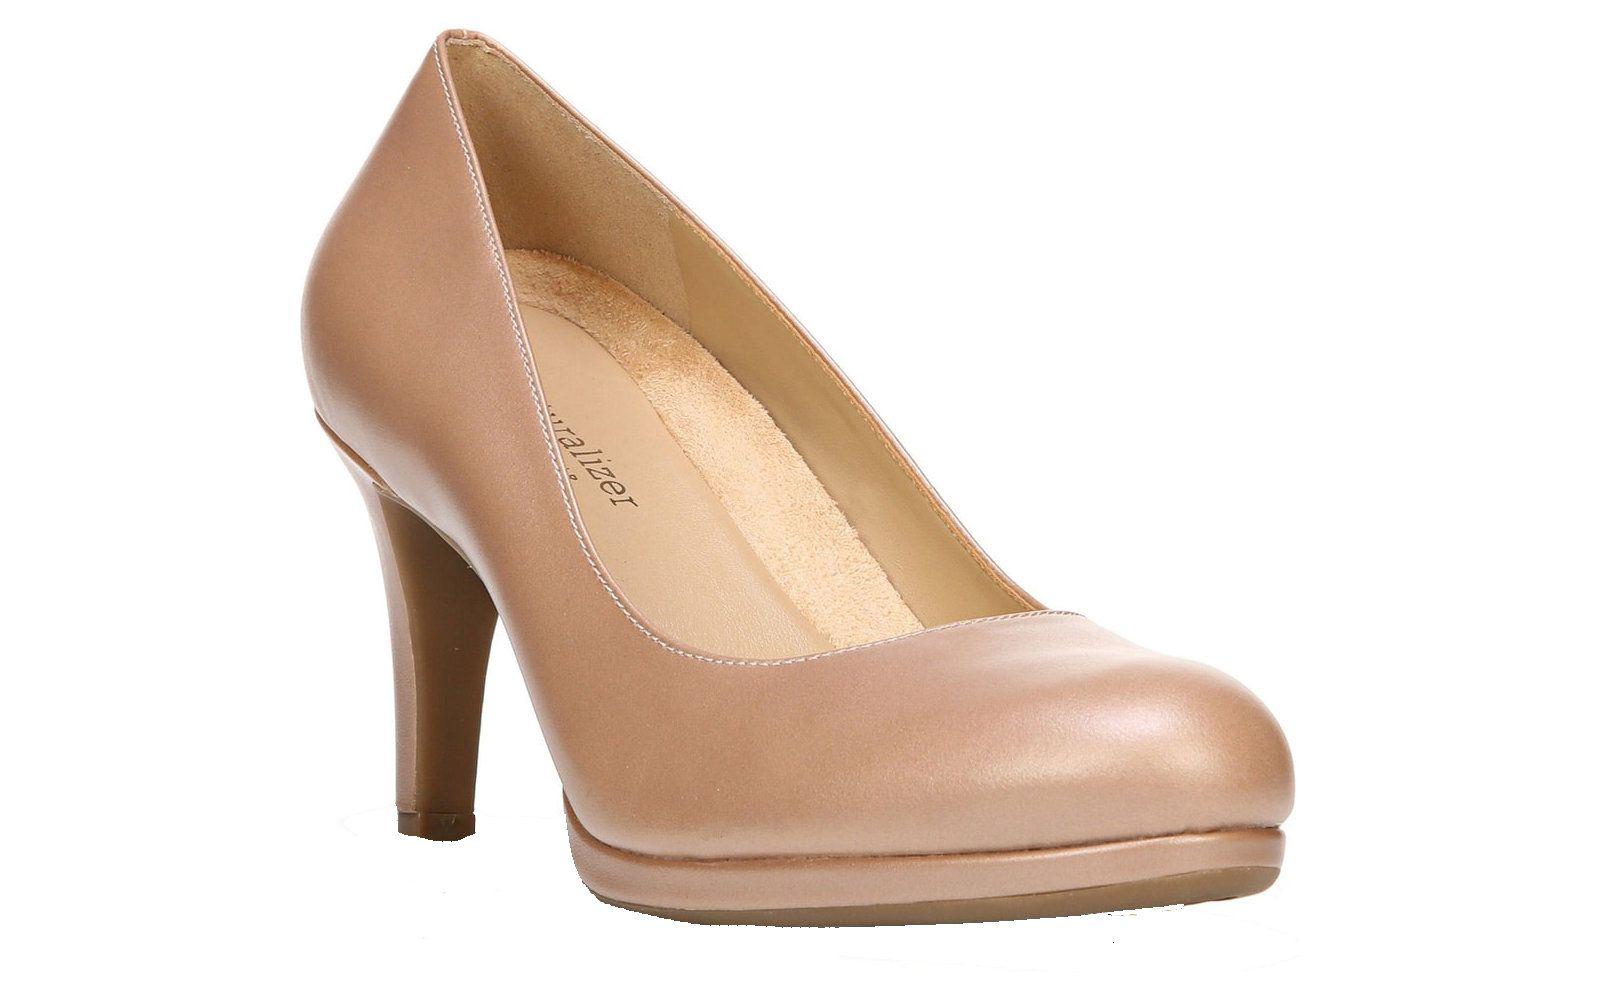 13 Most Comfortable Heels For 2020 According To Customers Comfortable Heels Most Comfortable High Heels Heels